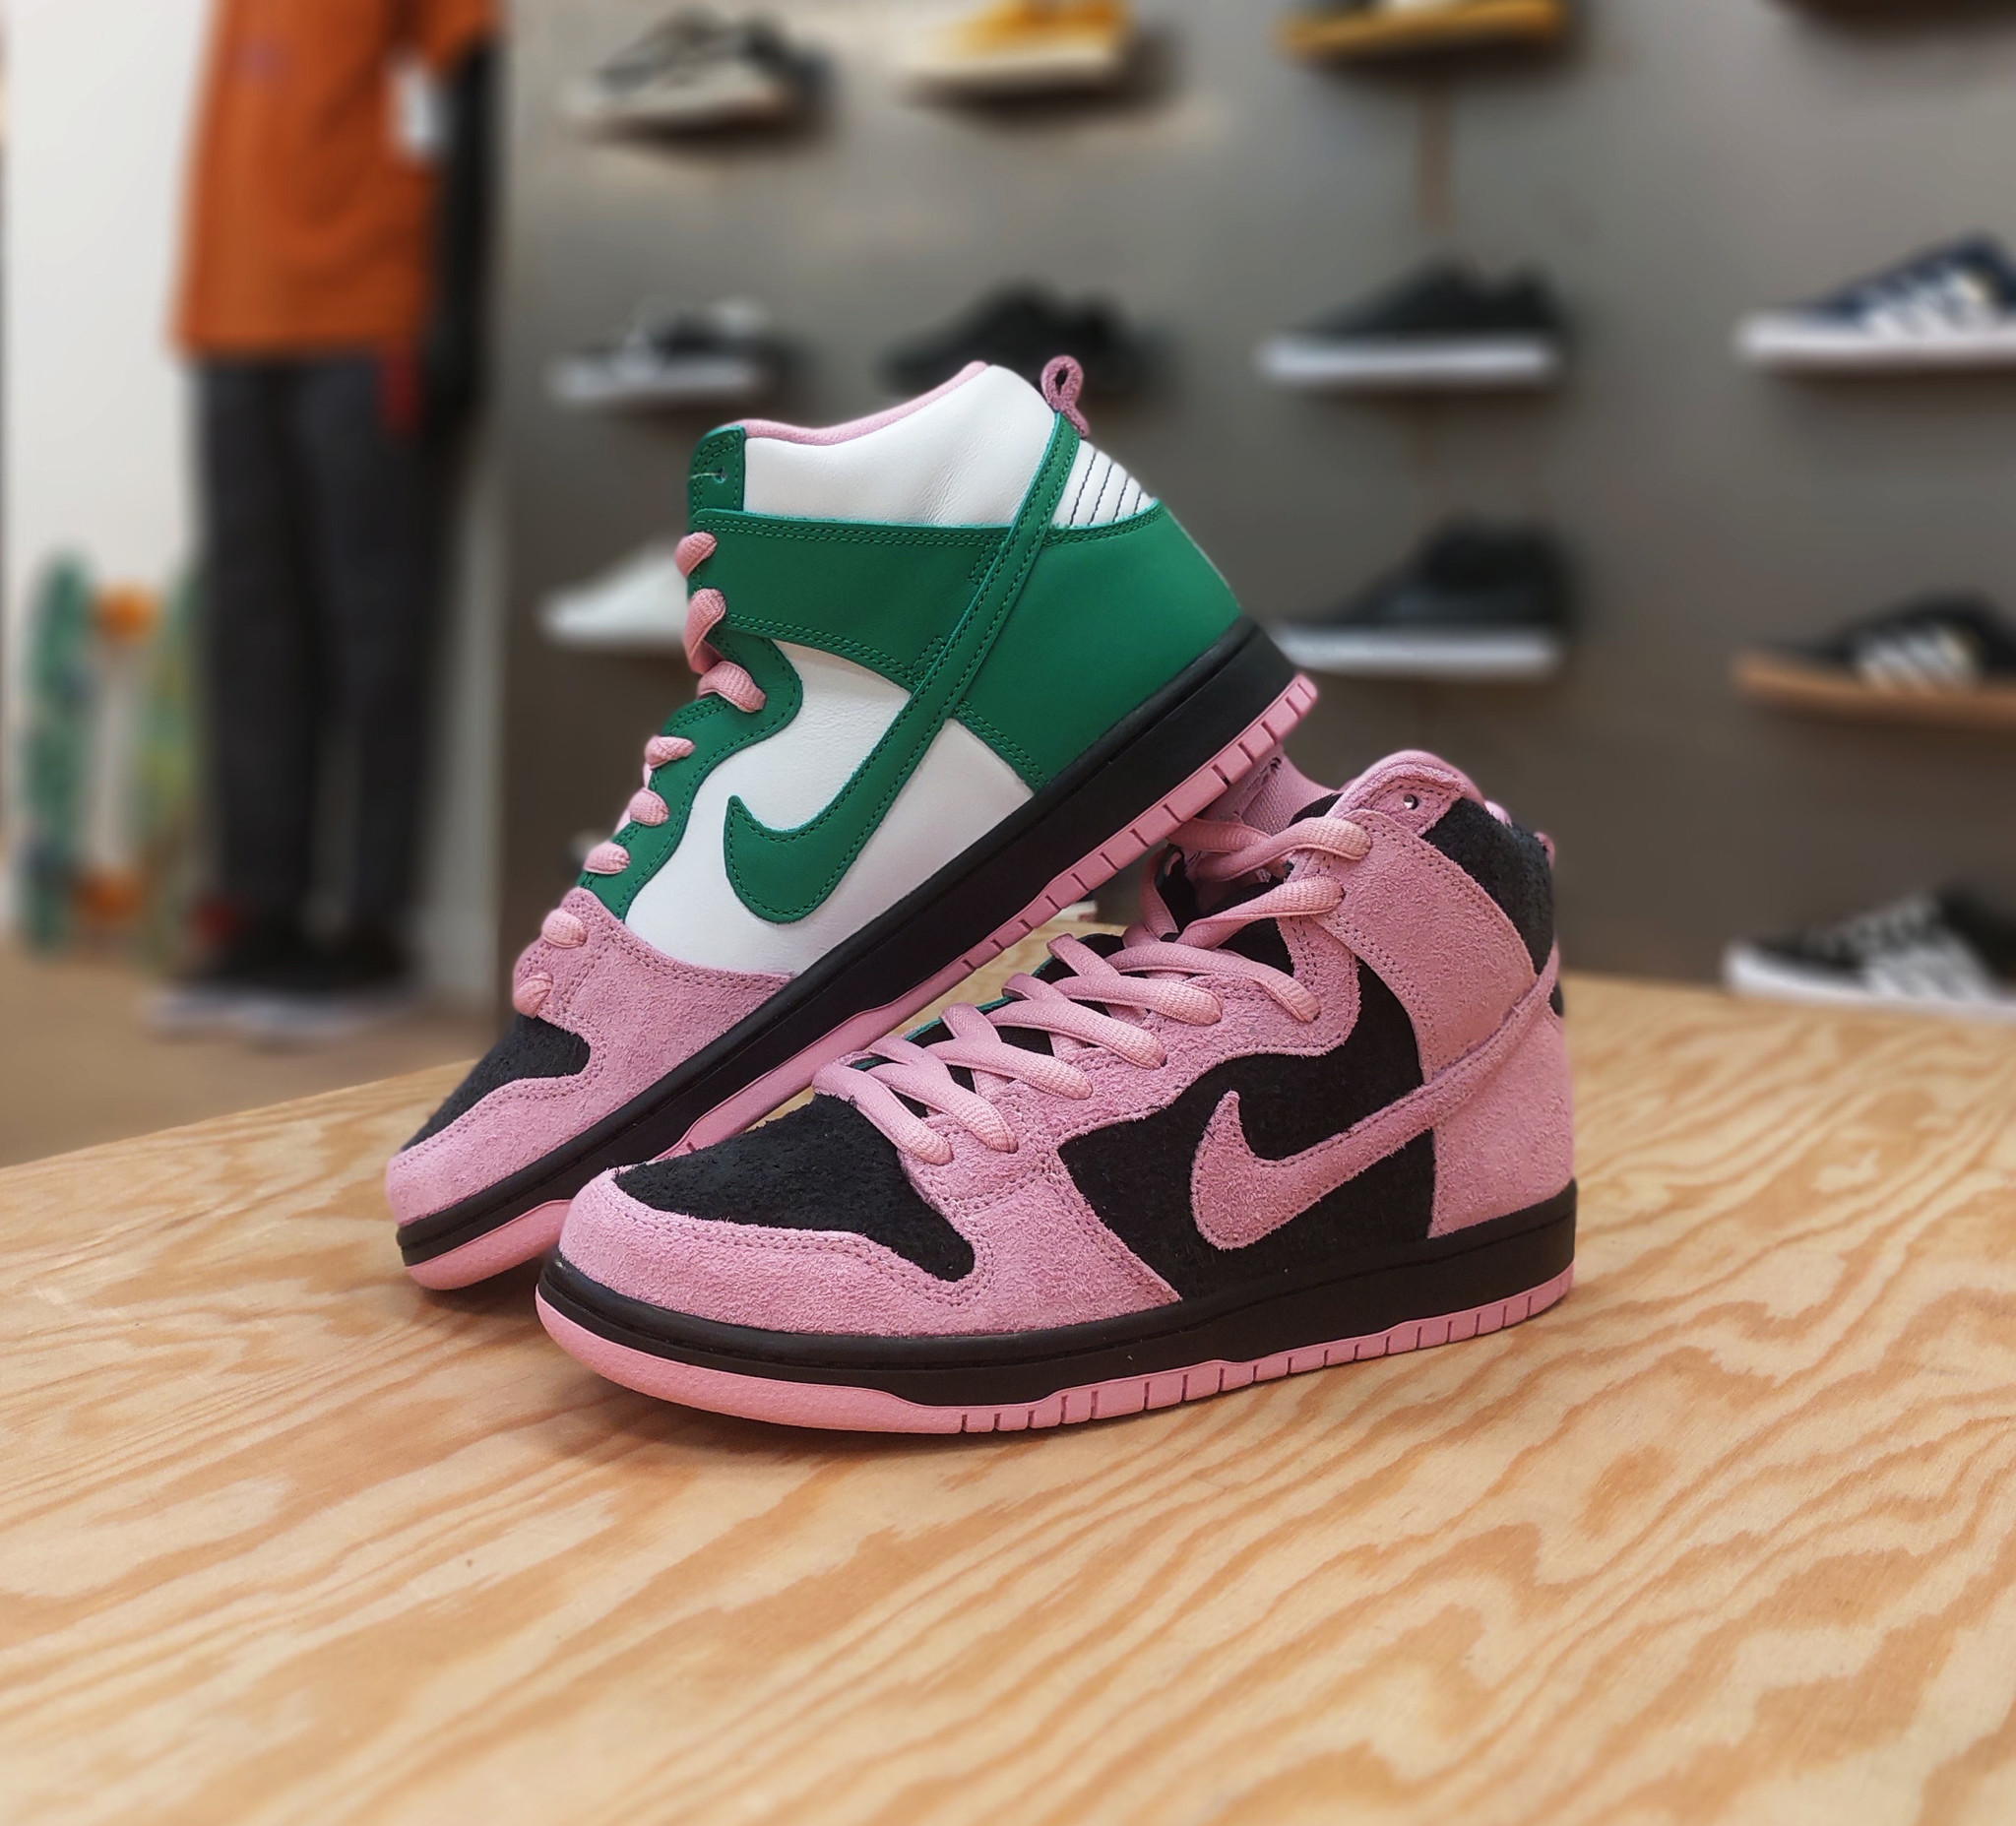 Nike SB Dunk High Pro Invert Celtics Raffle